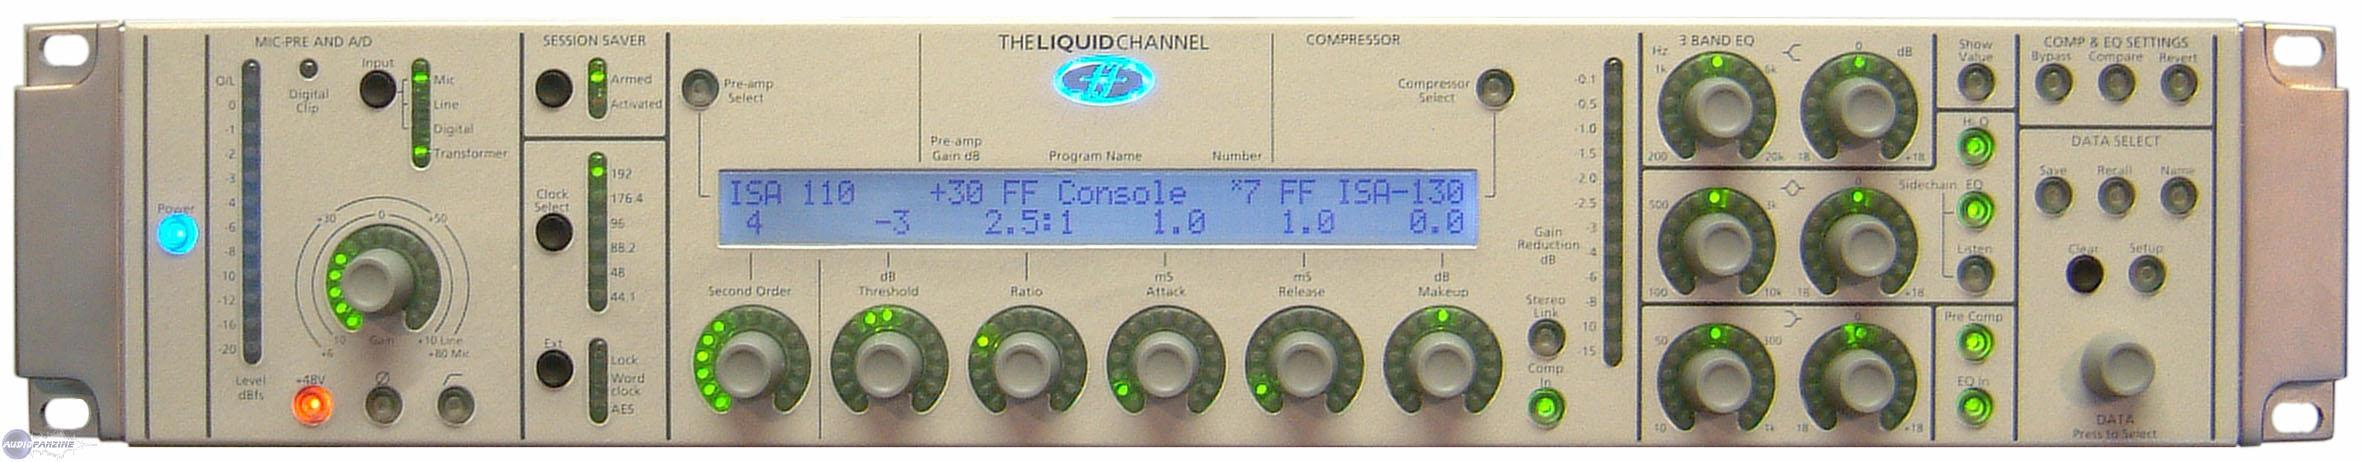 Avis Dutilisateurs Focusrite Liquid Channel Audiofanzine Simulation D39un Circuit Purementanalogique